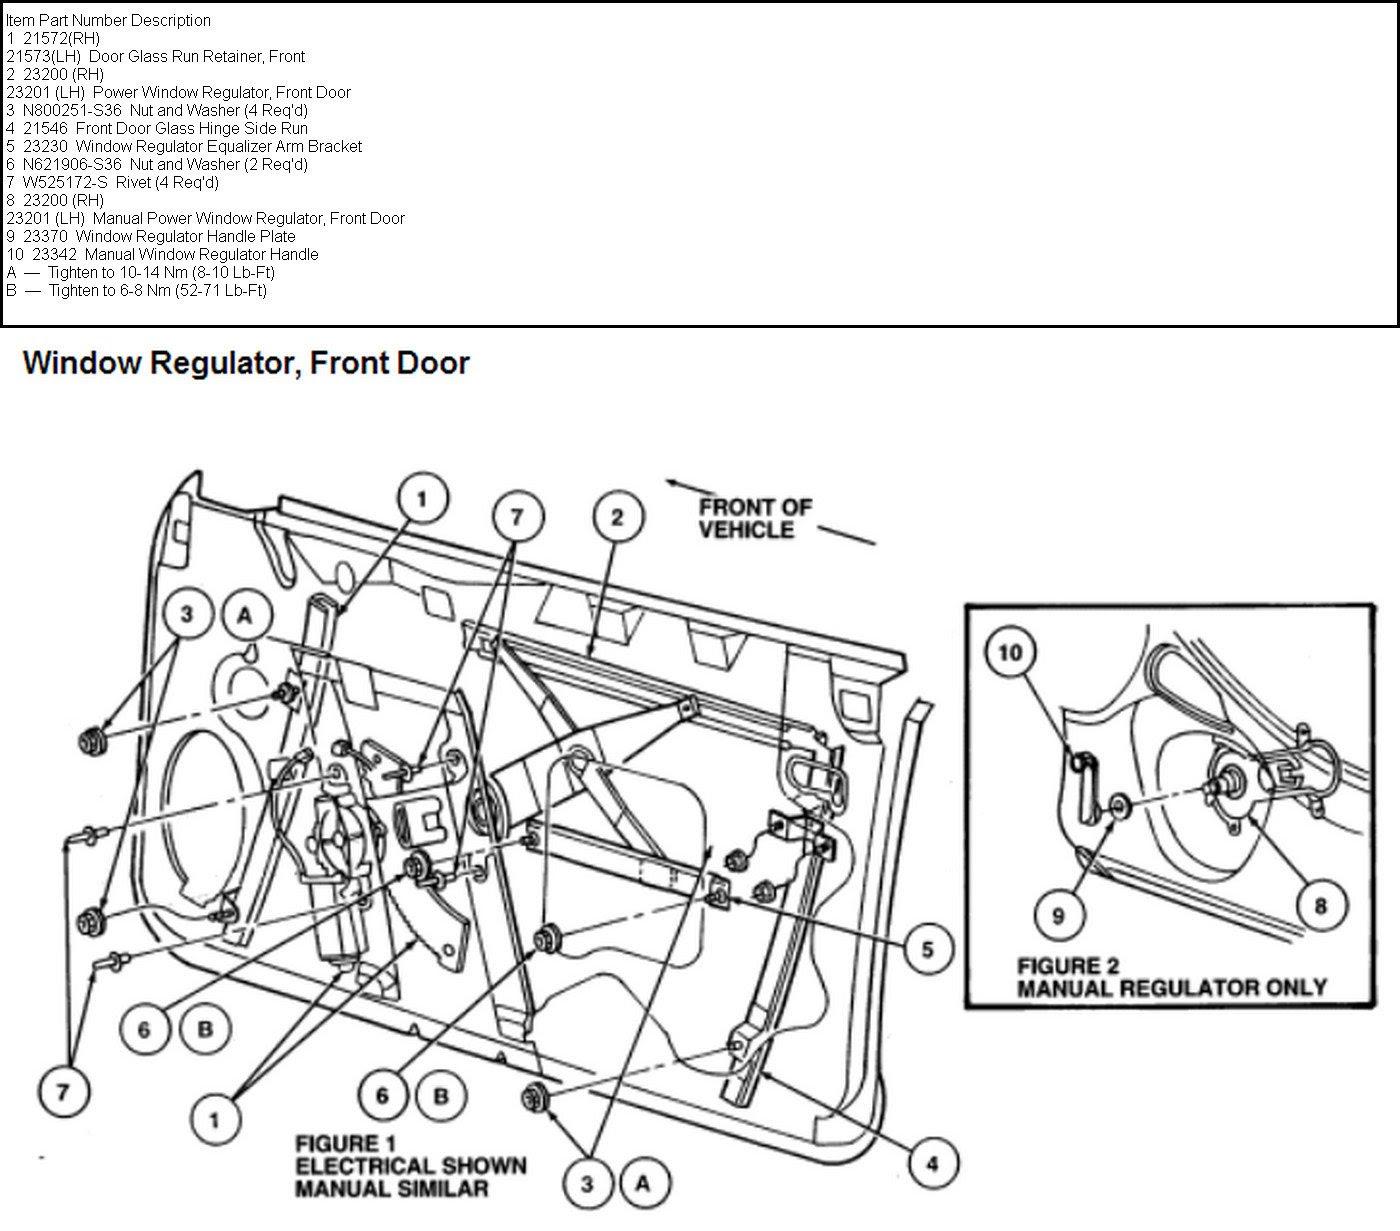 Diagram Wiring Diagram Power Window Motor Full Version Hd Quality Window Motor Diagramcrealb Gotoscana It